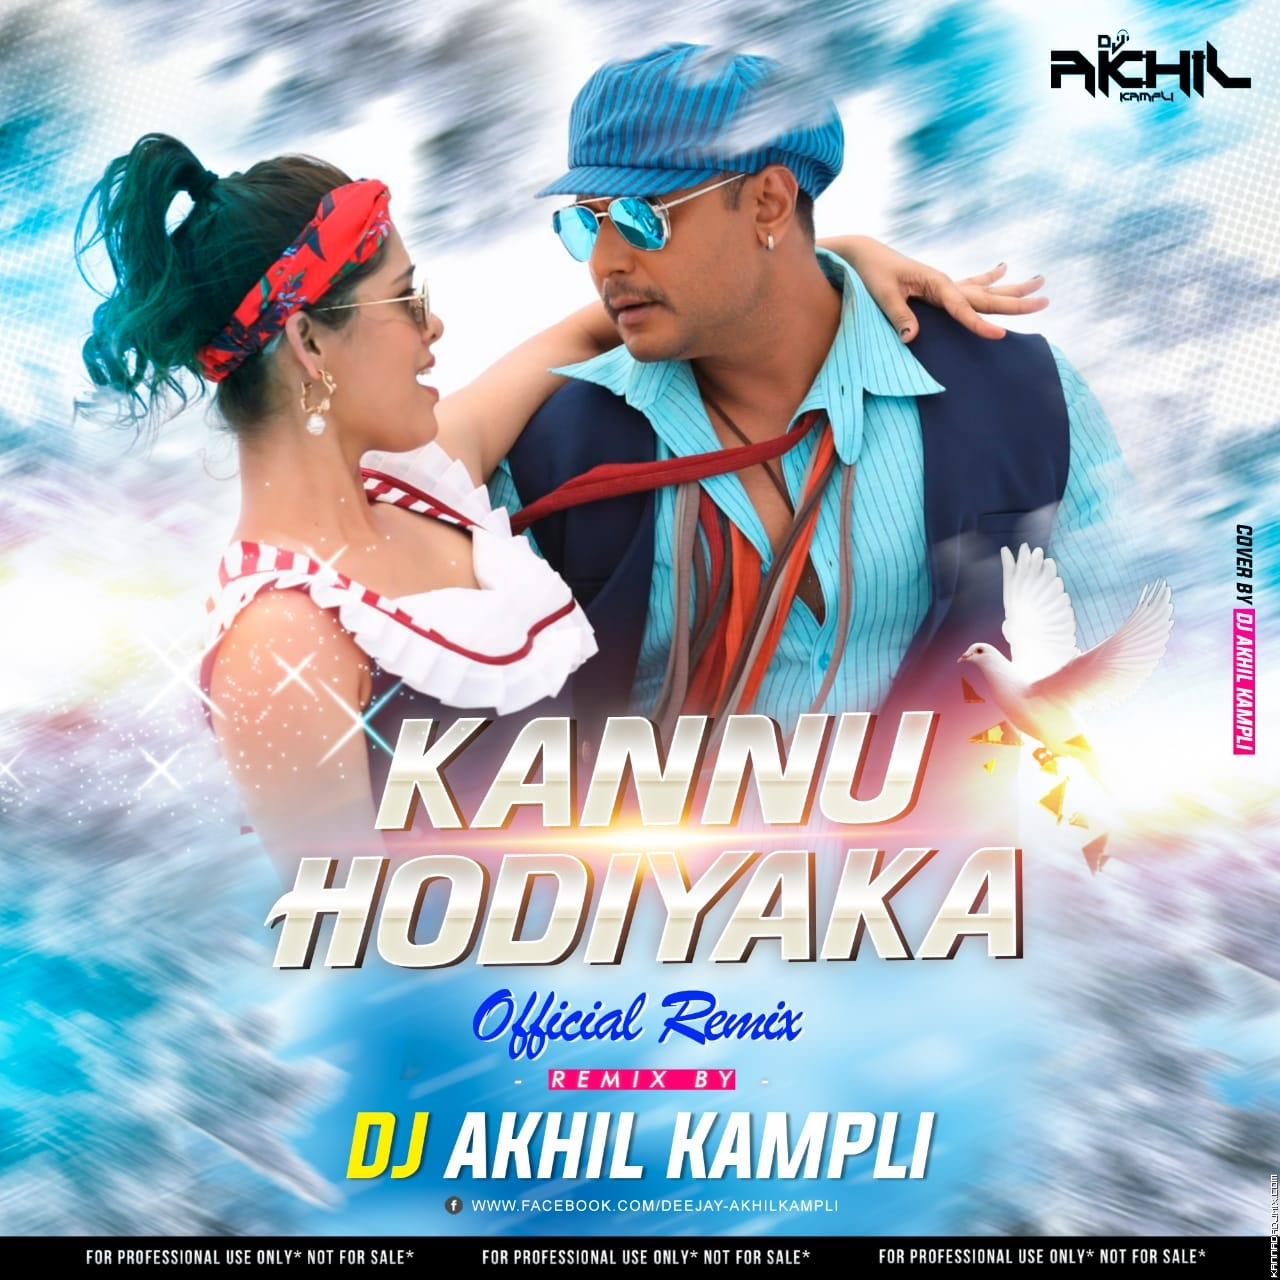 Kannu Hodiyaka Official Remix Dj Akhil Kampli.mp3